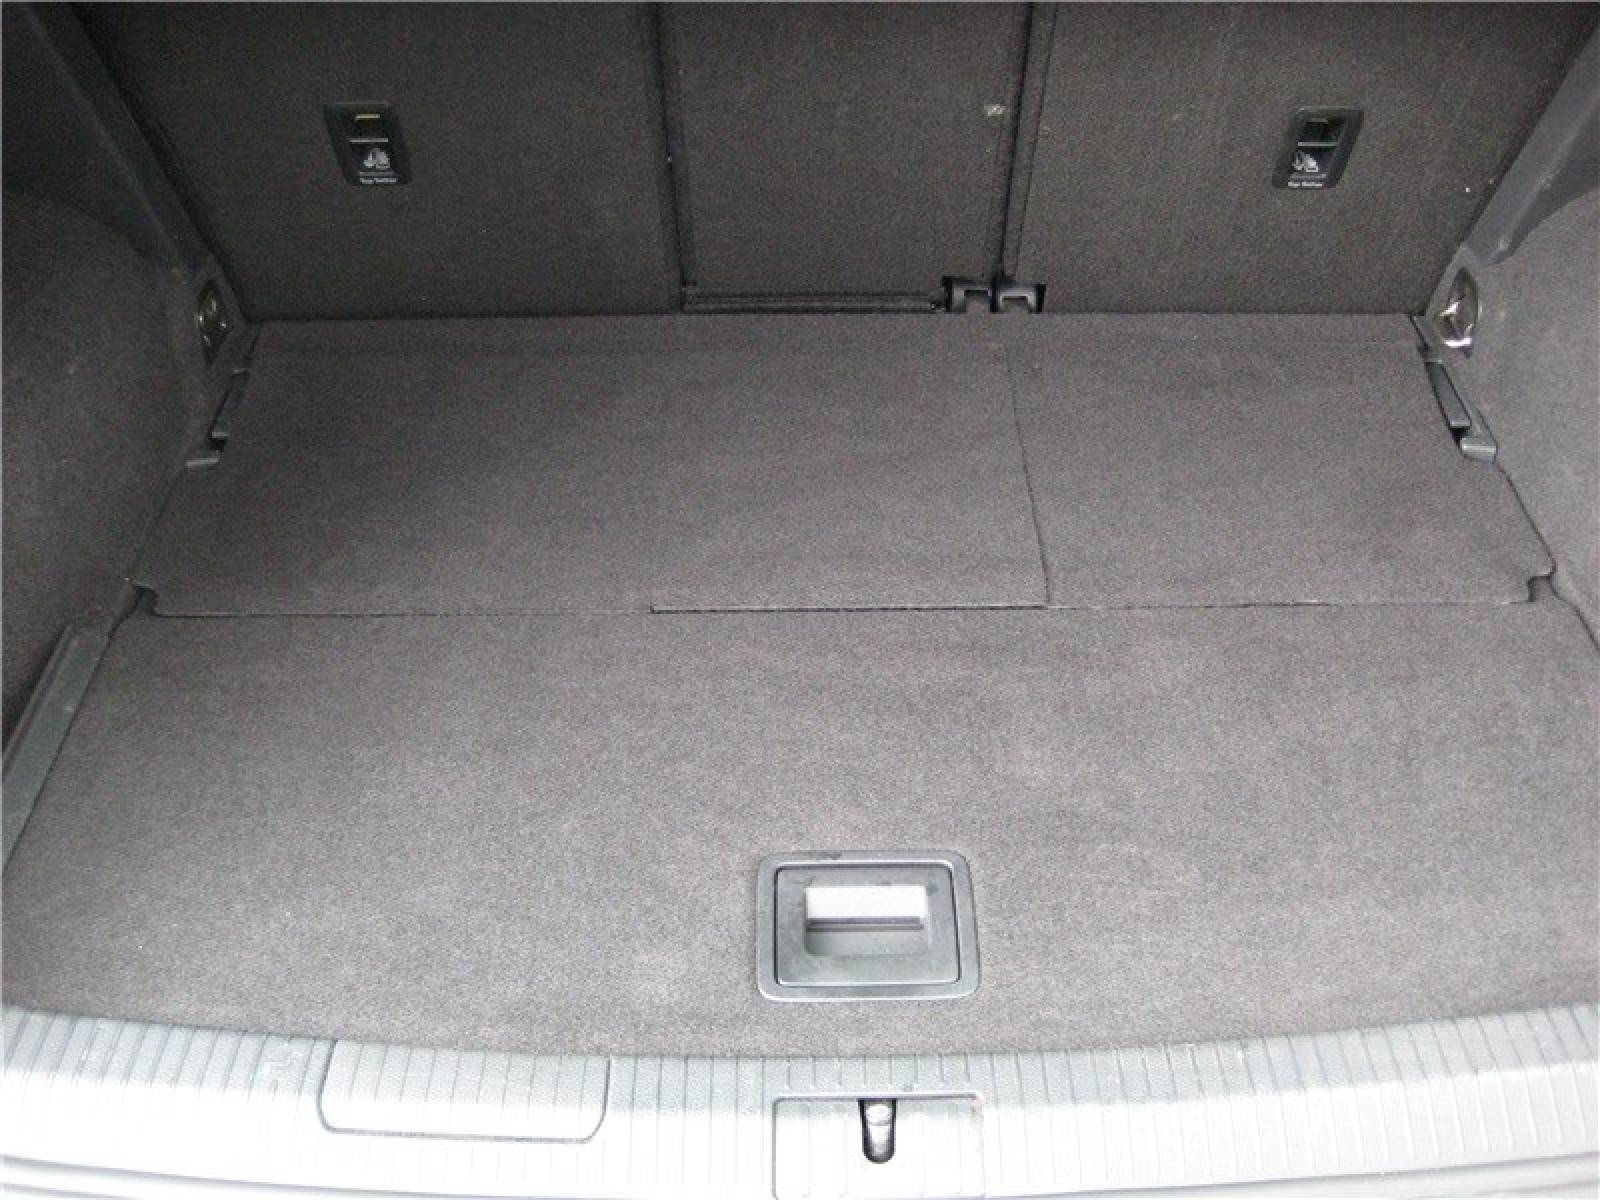 VOLKSWAGEN Golf Sportsvan 1.6 TDI 110 FAP BlueMotion Technology - véhicule d'occasion - LEMAUVIEL AUTOMOBILES - Présentation site web V2 - Lemauviel Automobiles - VIRE - 14500 - VIRE - 17